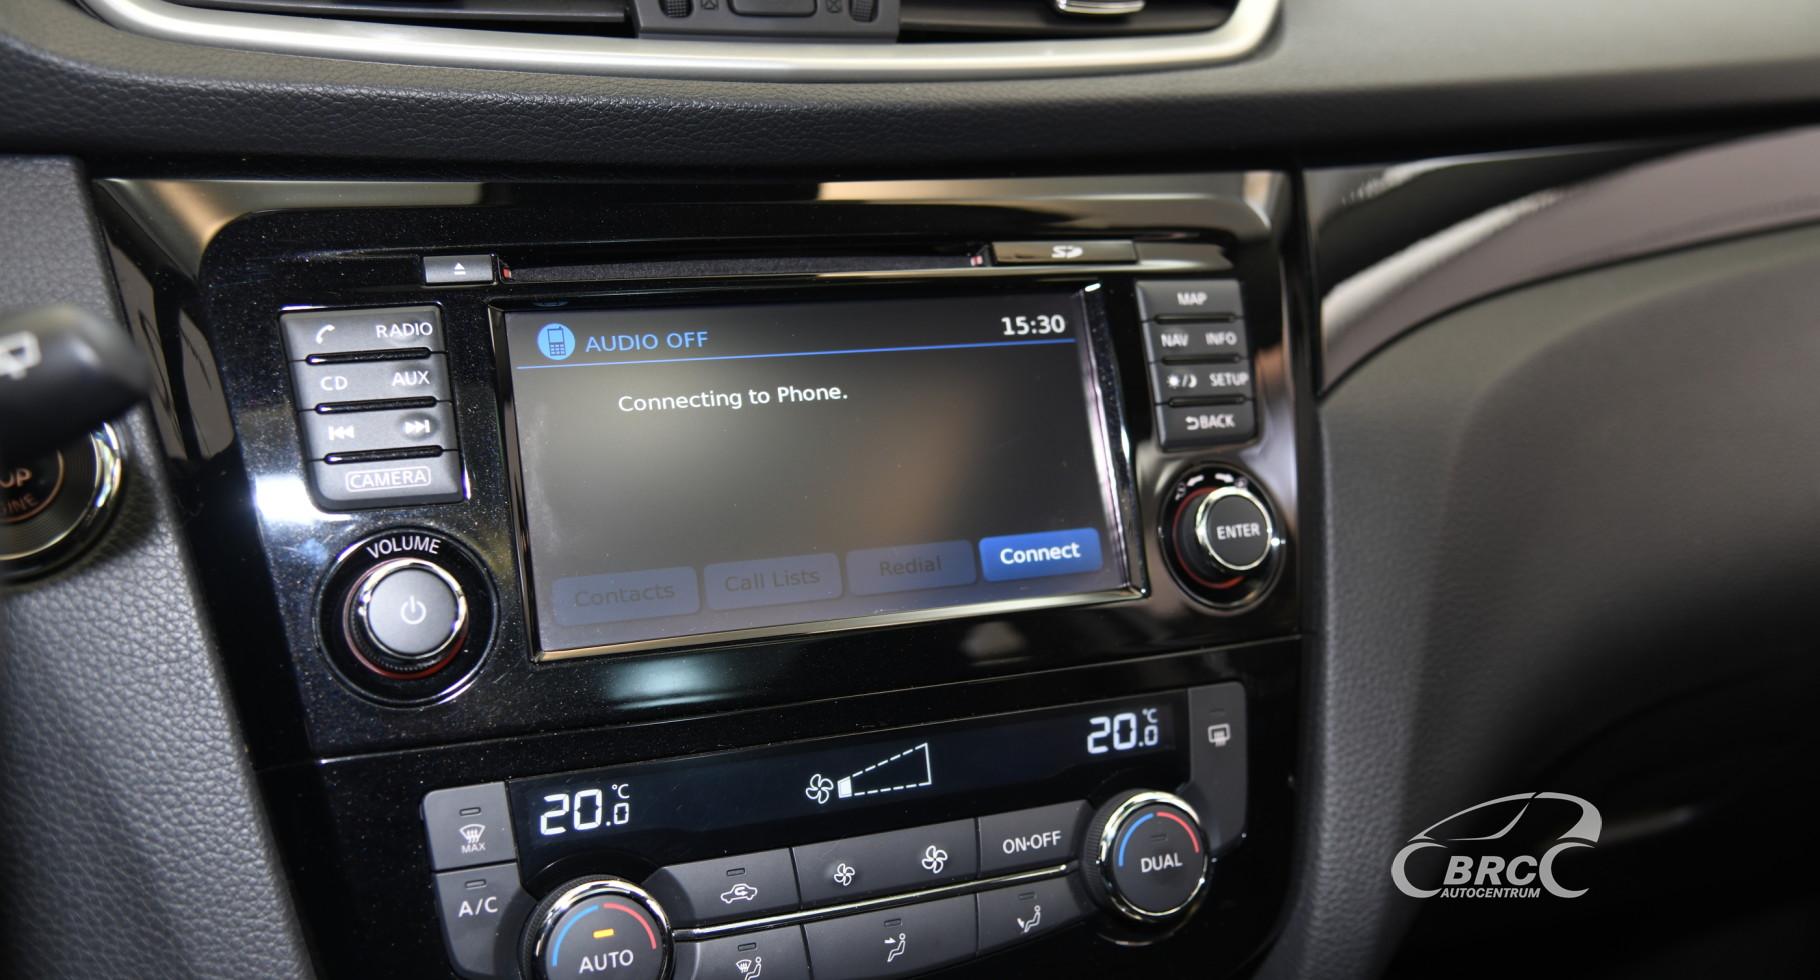 Nissan Qashqai 1.2 DIG-T N-connect Automatas